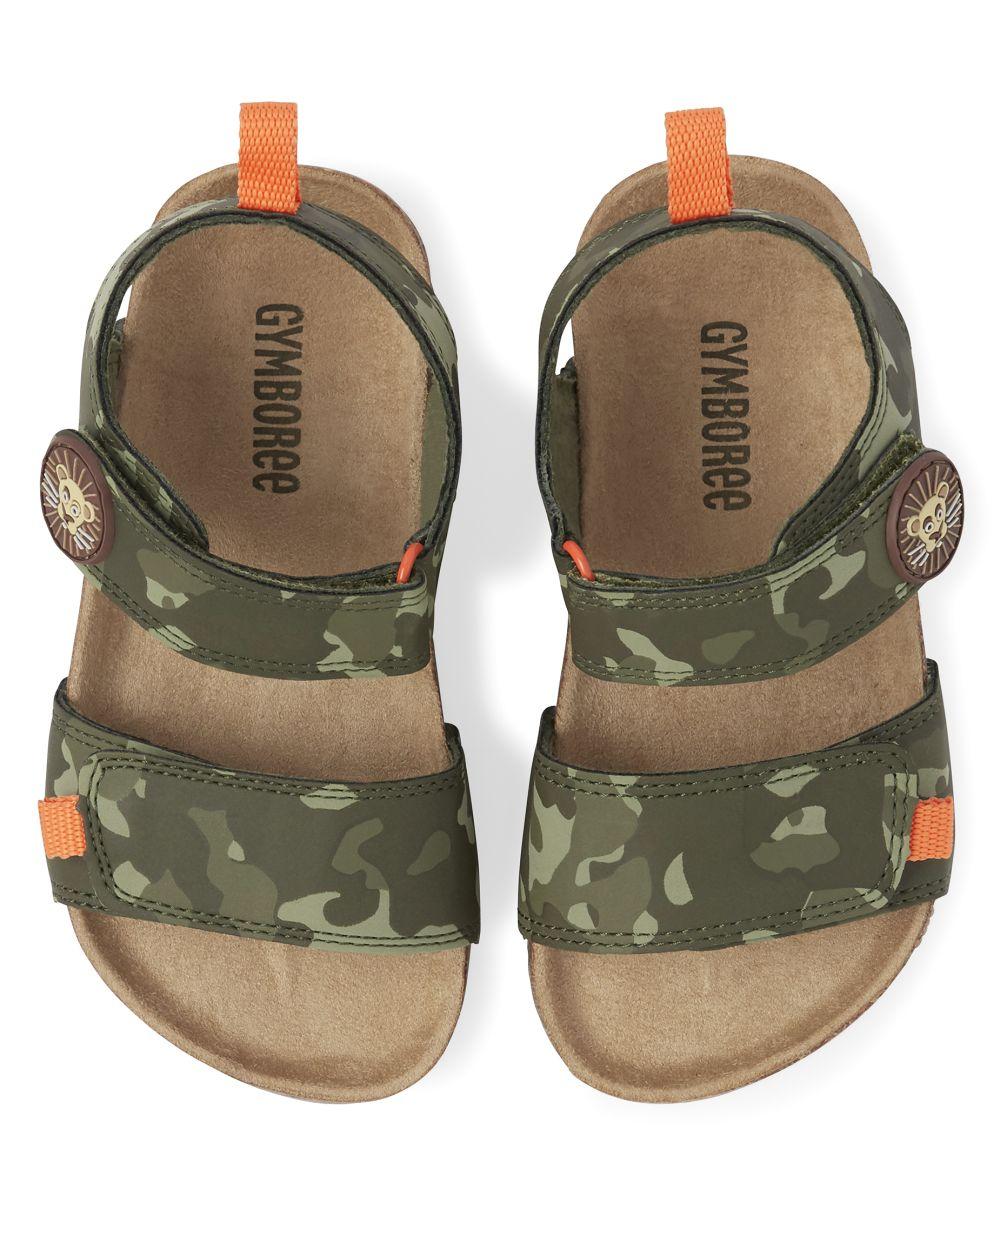 Boys Camo Sandals - Summer Safari